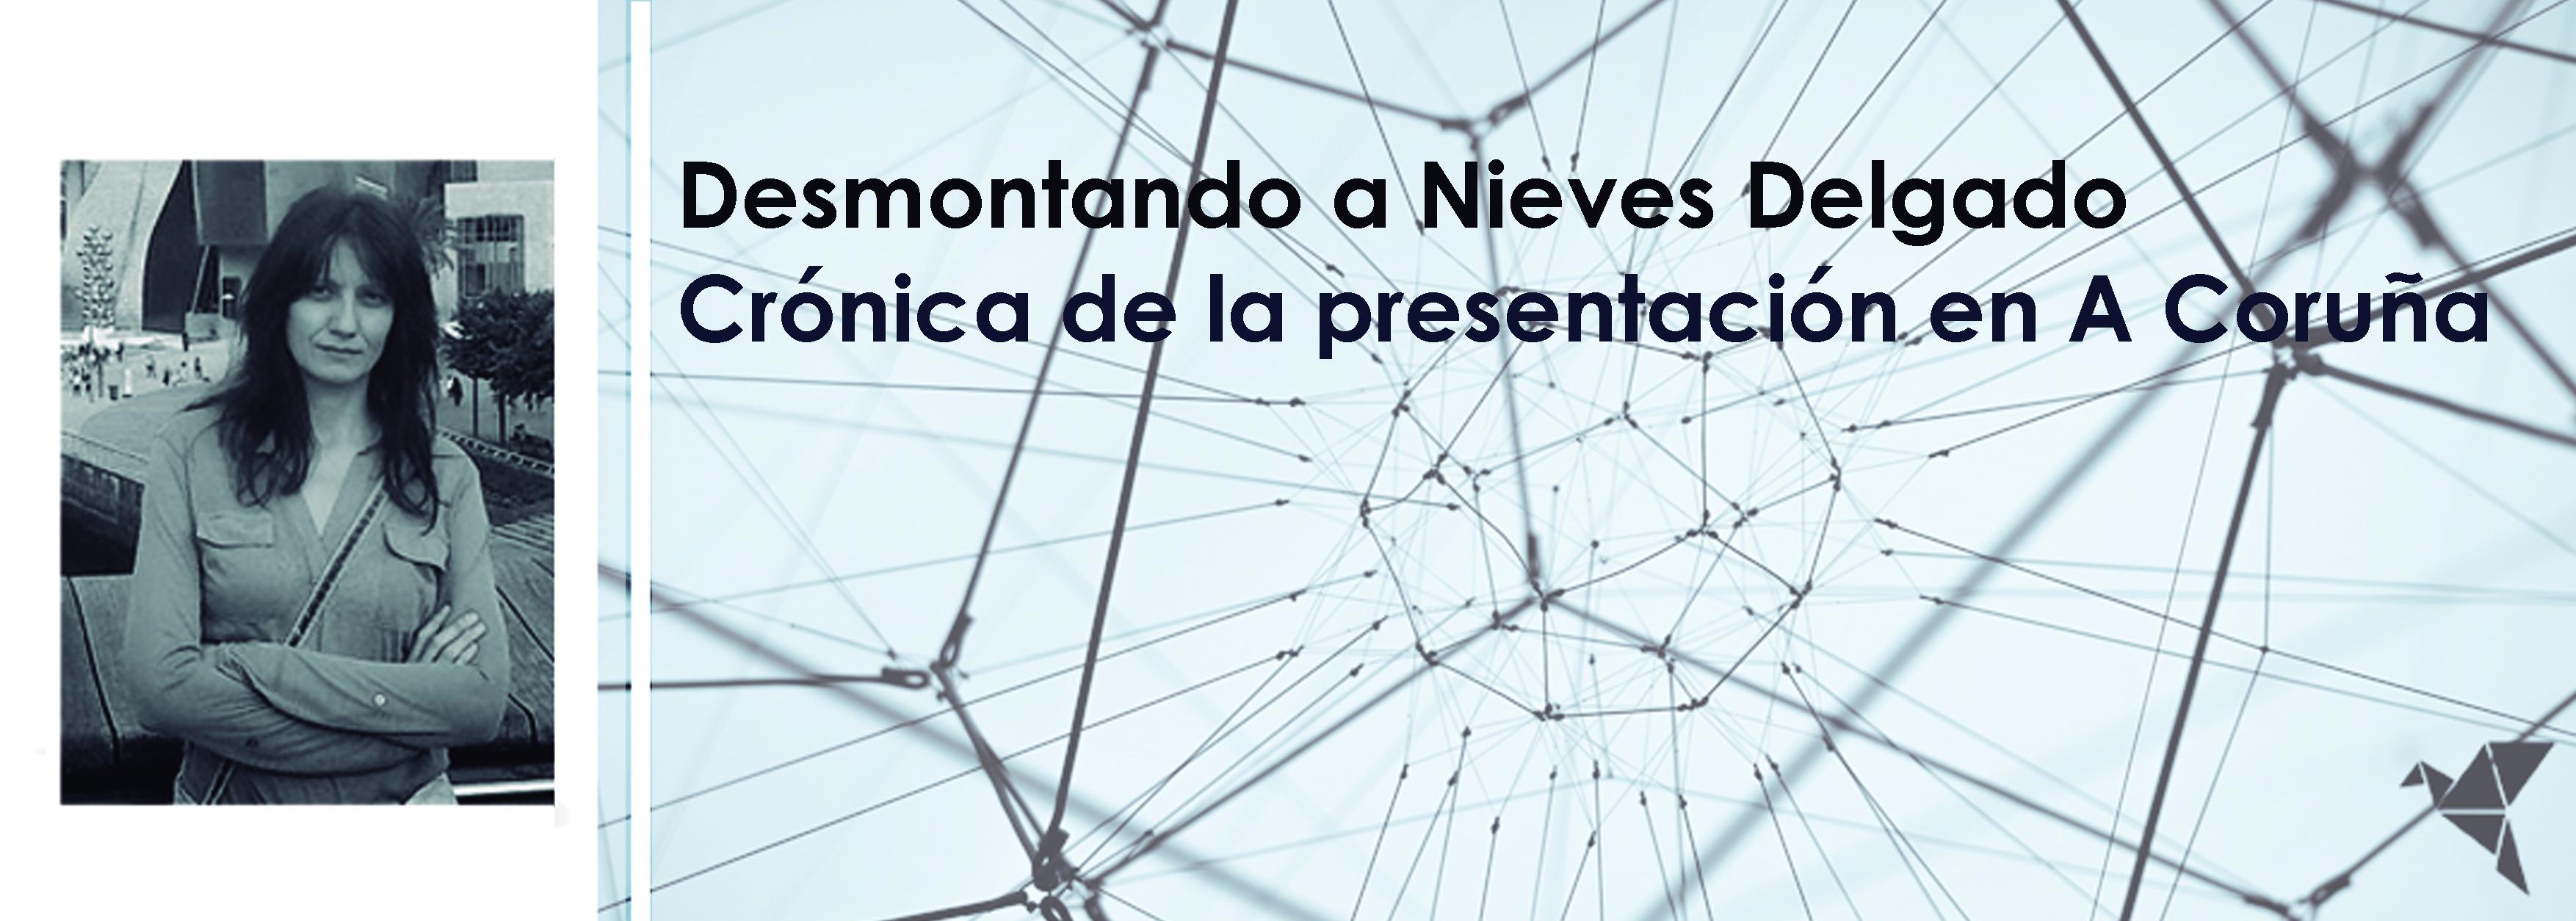 Presentación literaria: Desmontando a Nieves Delgado